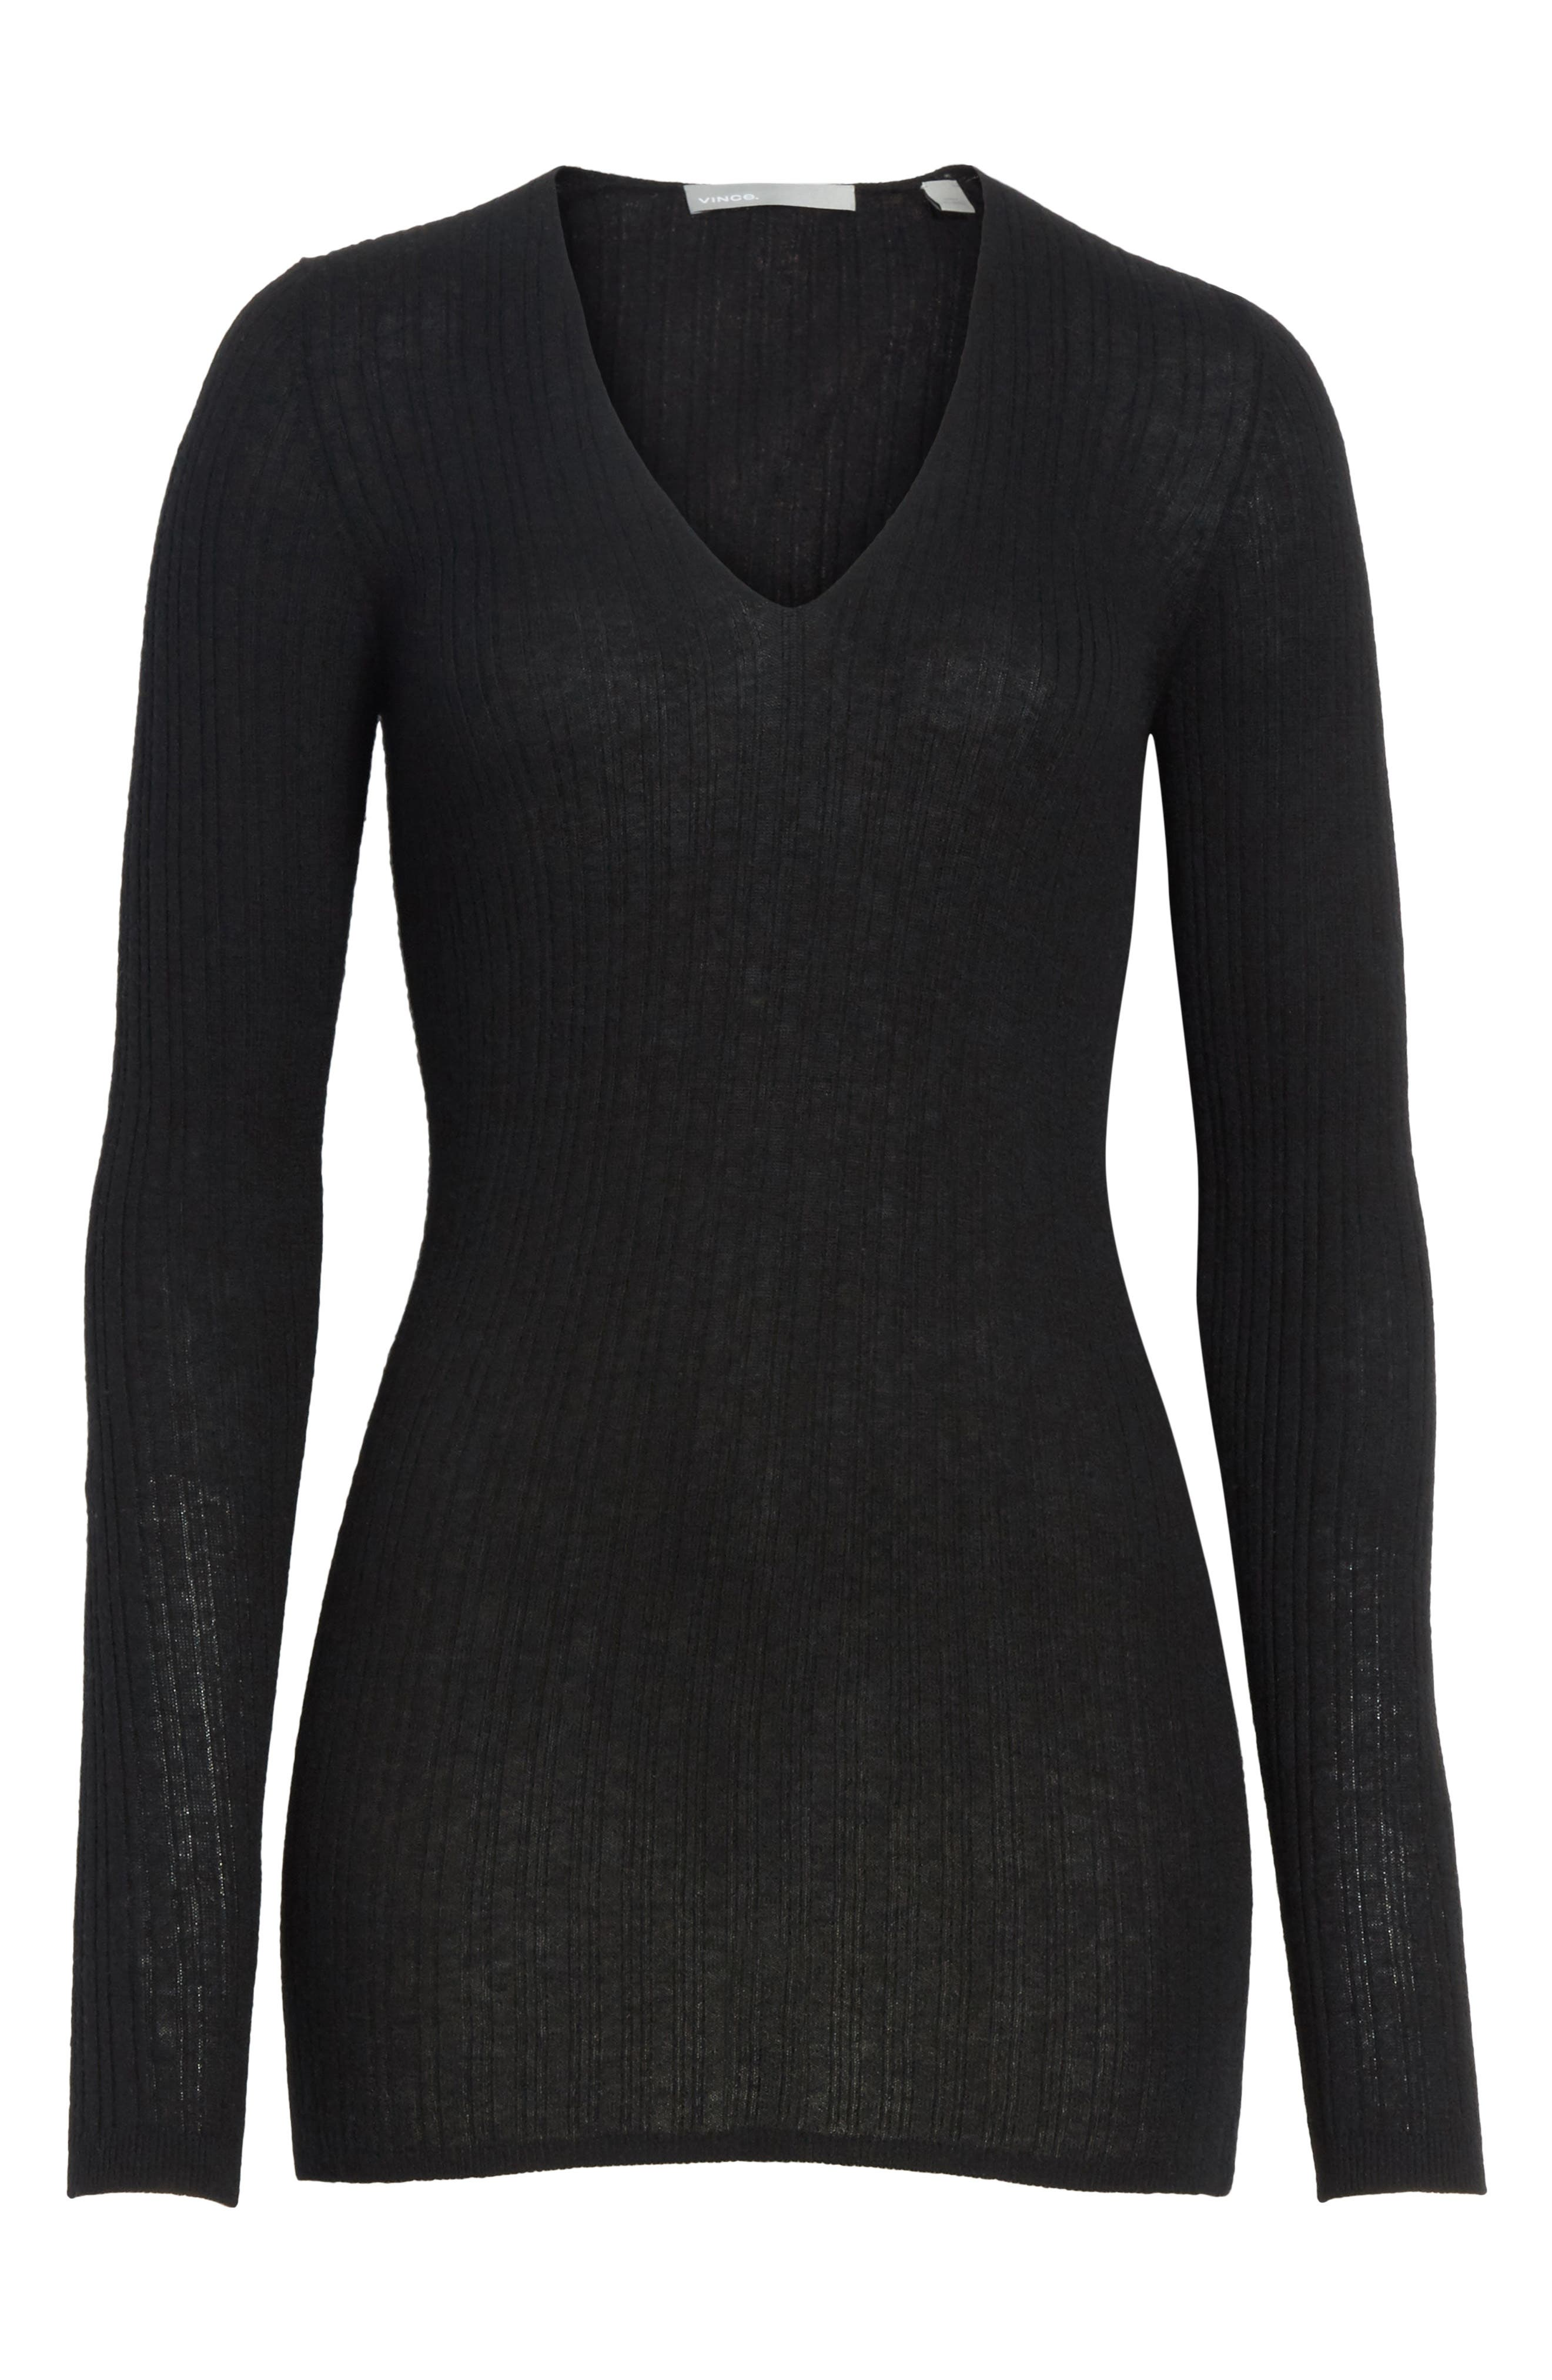 Ribbed Cashmere V-Neck Sweater,                             Alternate thumbnail 6, color,                             001